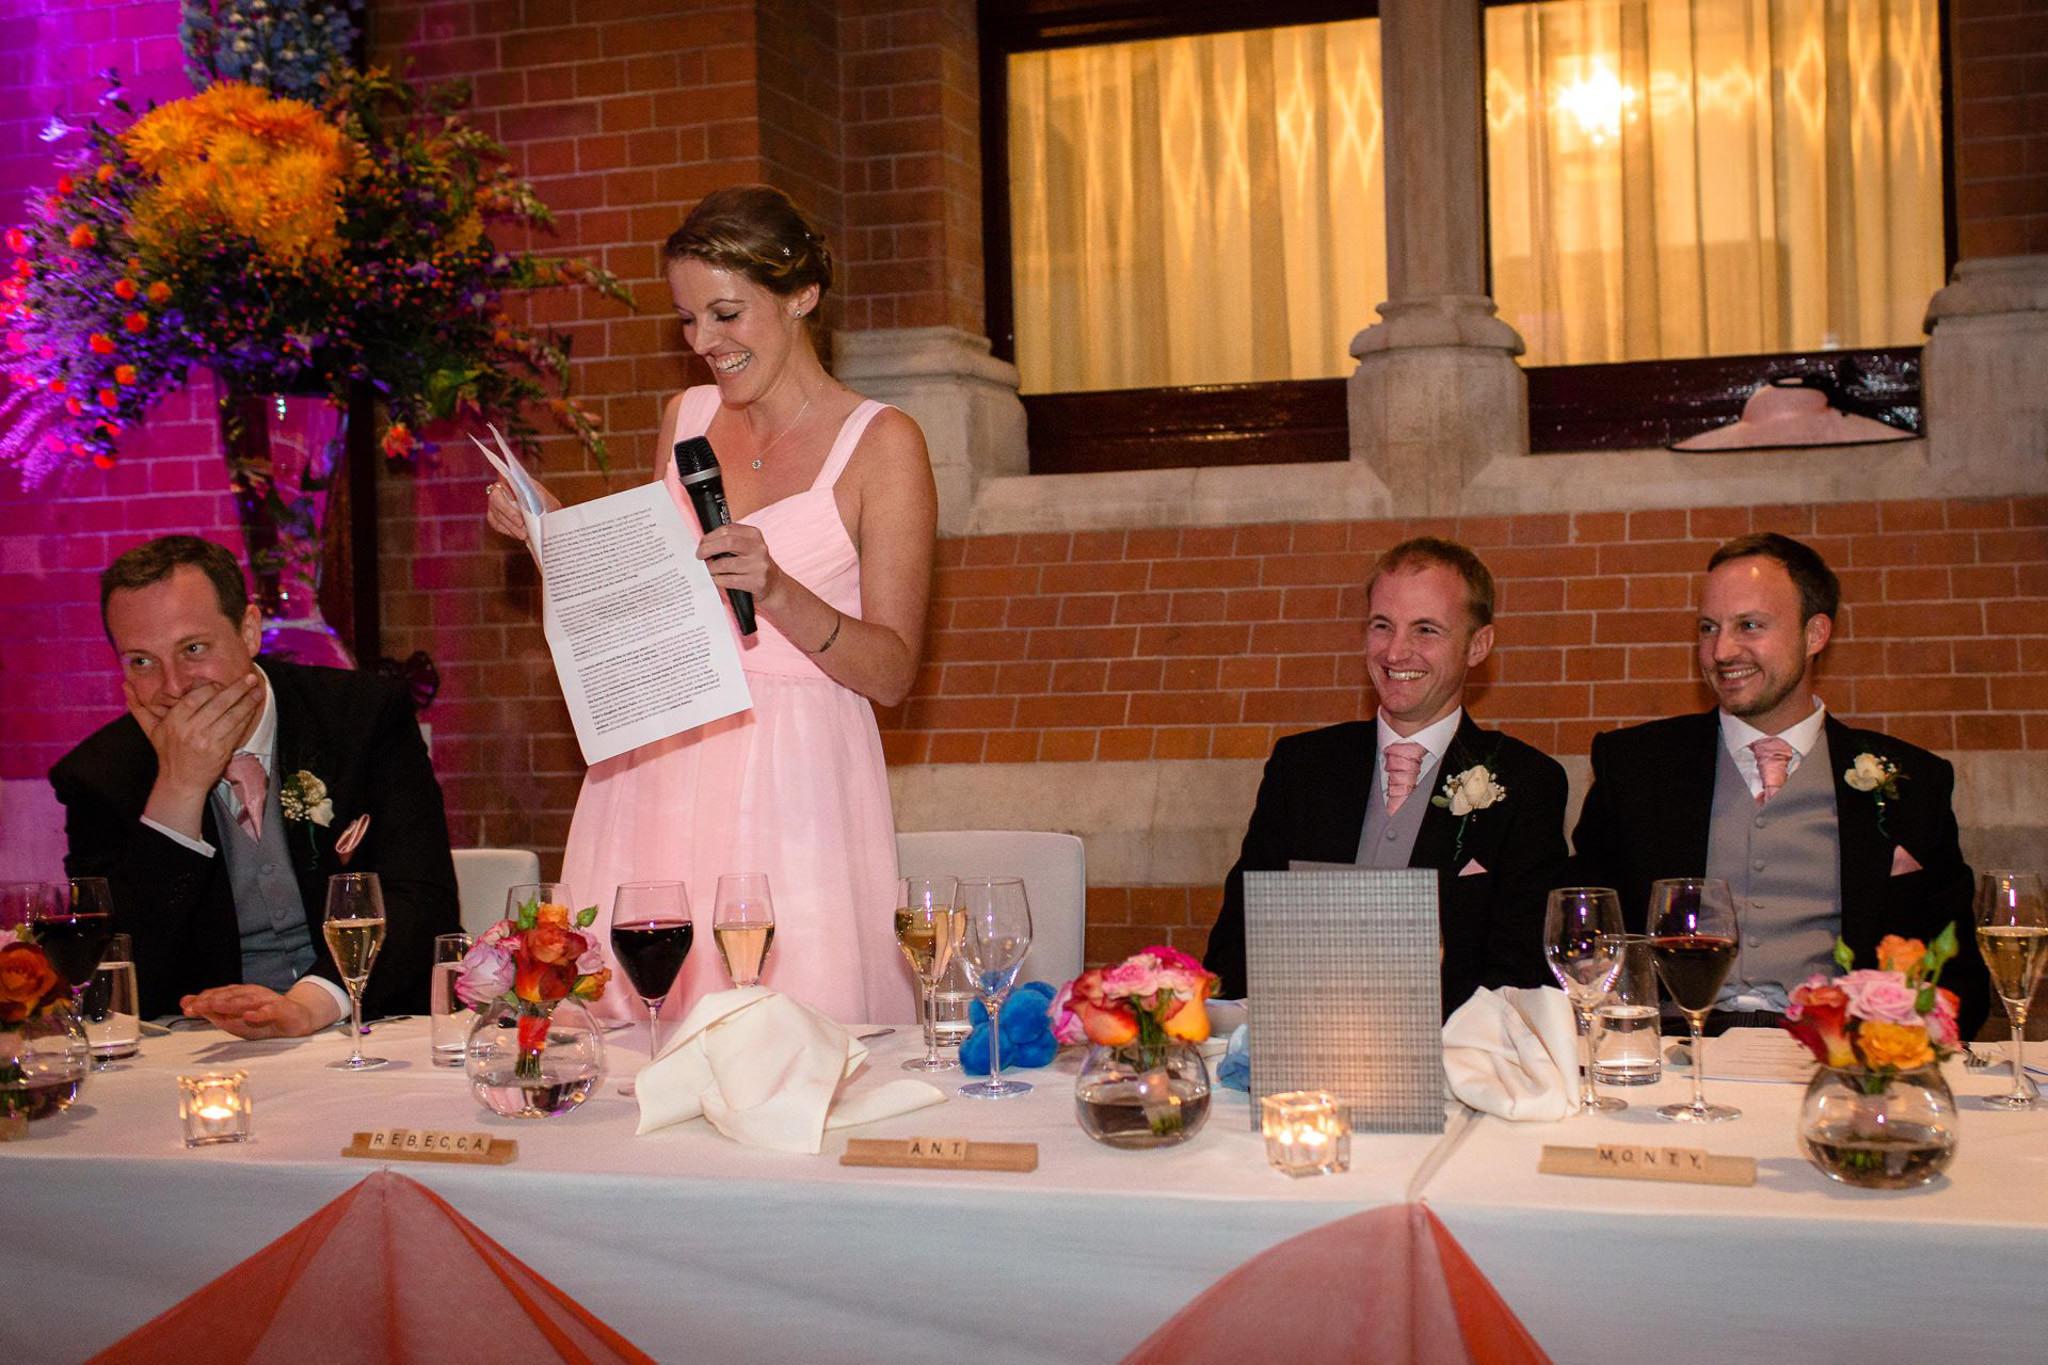 St. Pancras hotel wedding bridesmaid speech